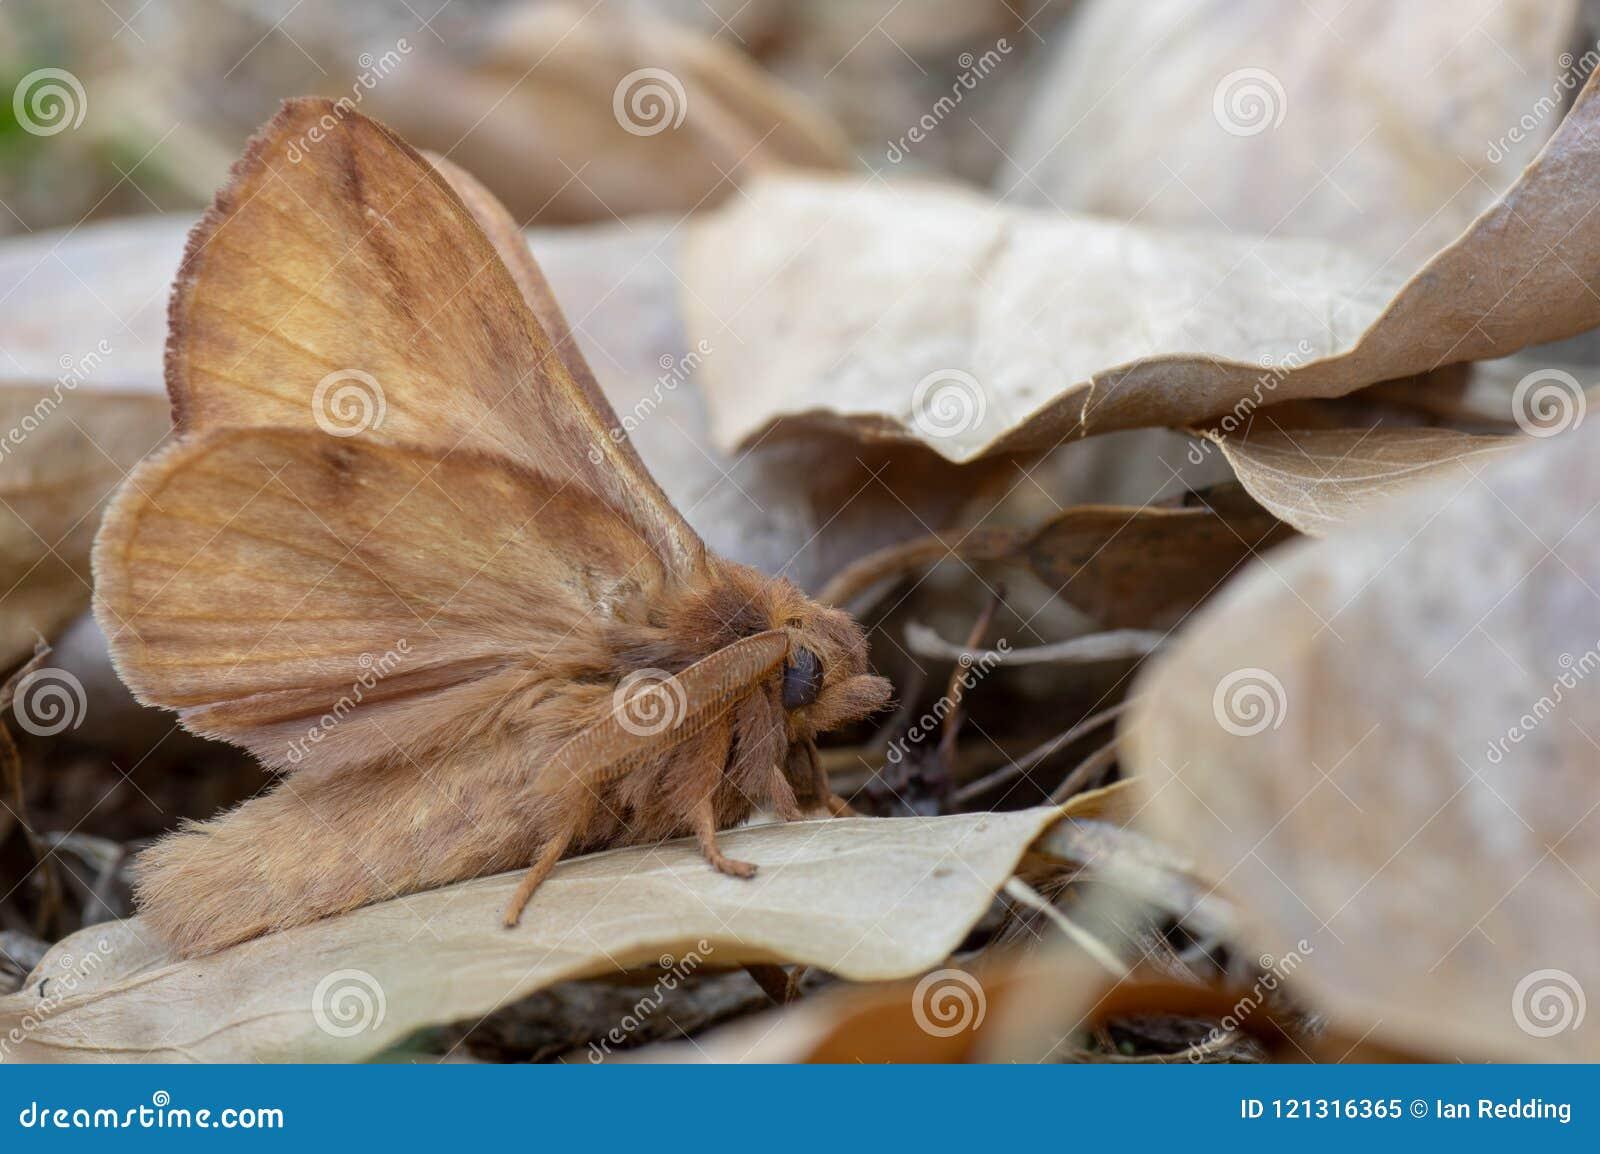 The drinker moth Euthrix potatoria amongst dead leaves